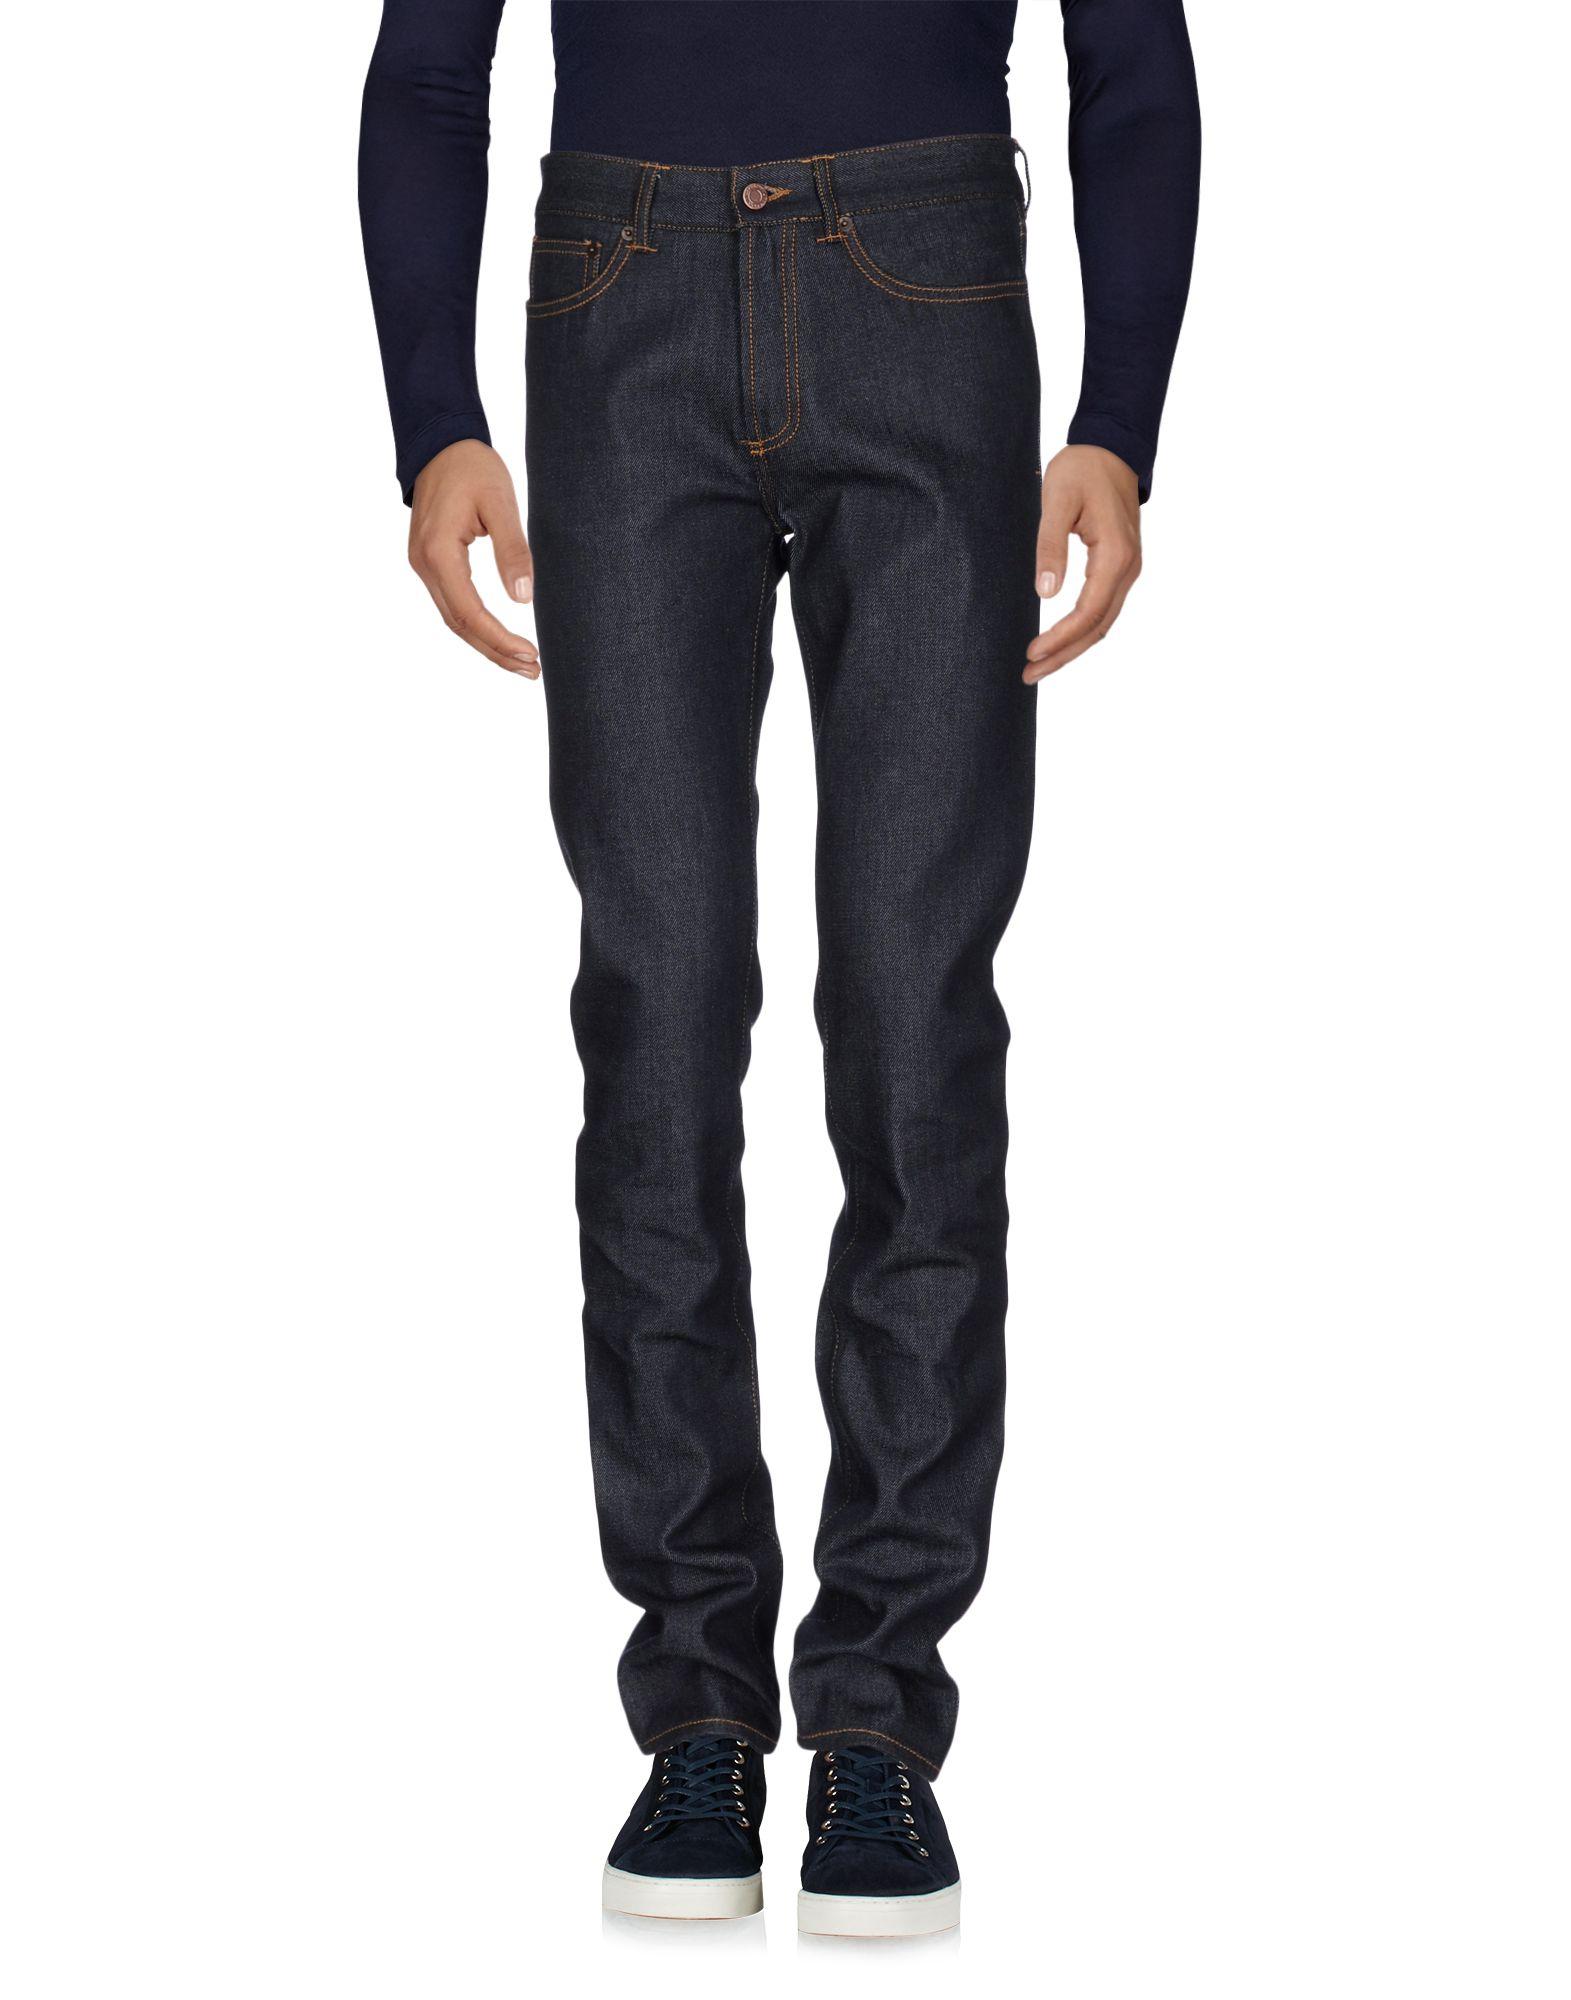 Givenchy Pantaloni Acquista su Jeans Uomo online aqq54Y